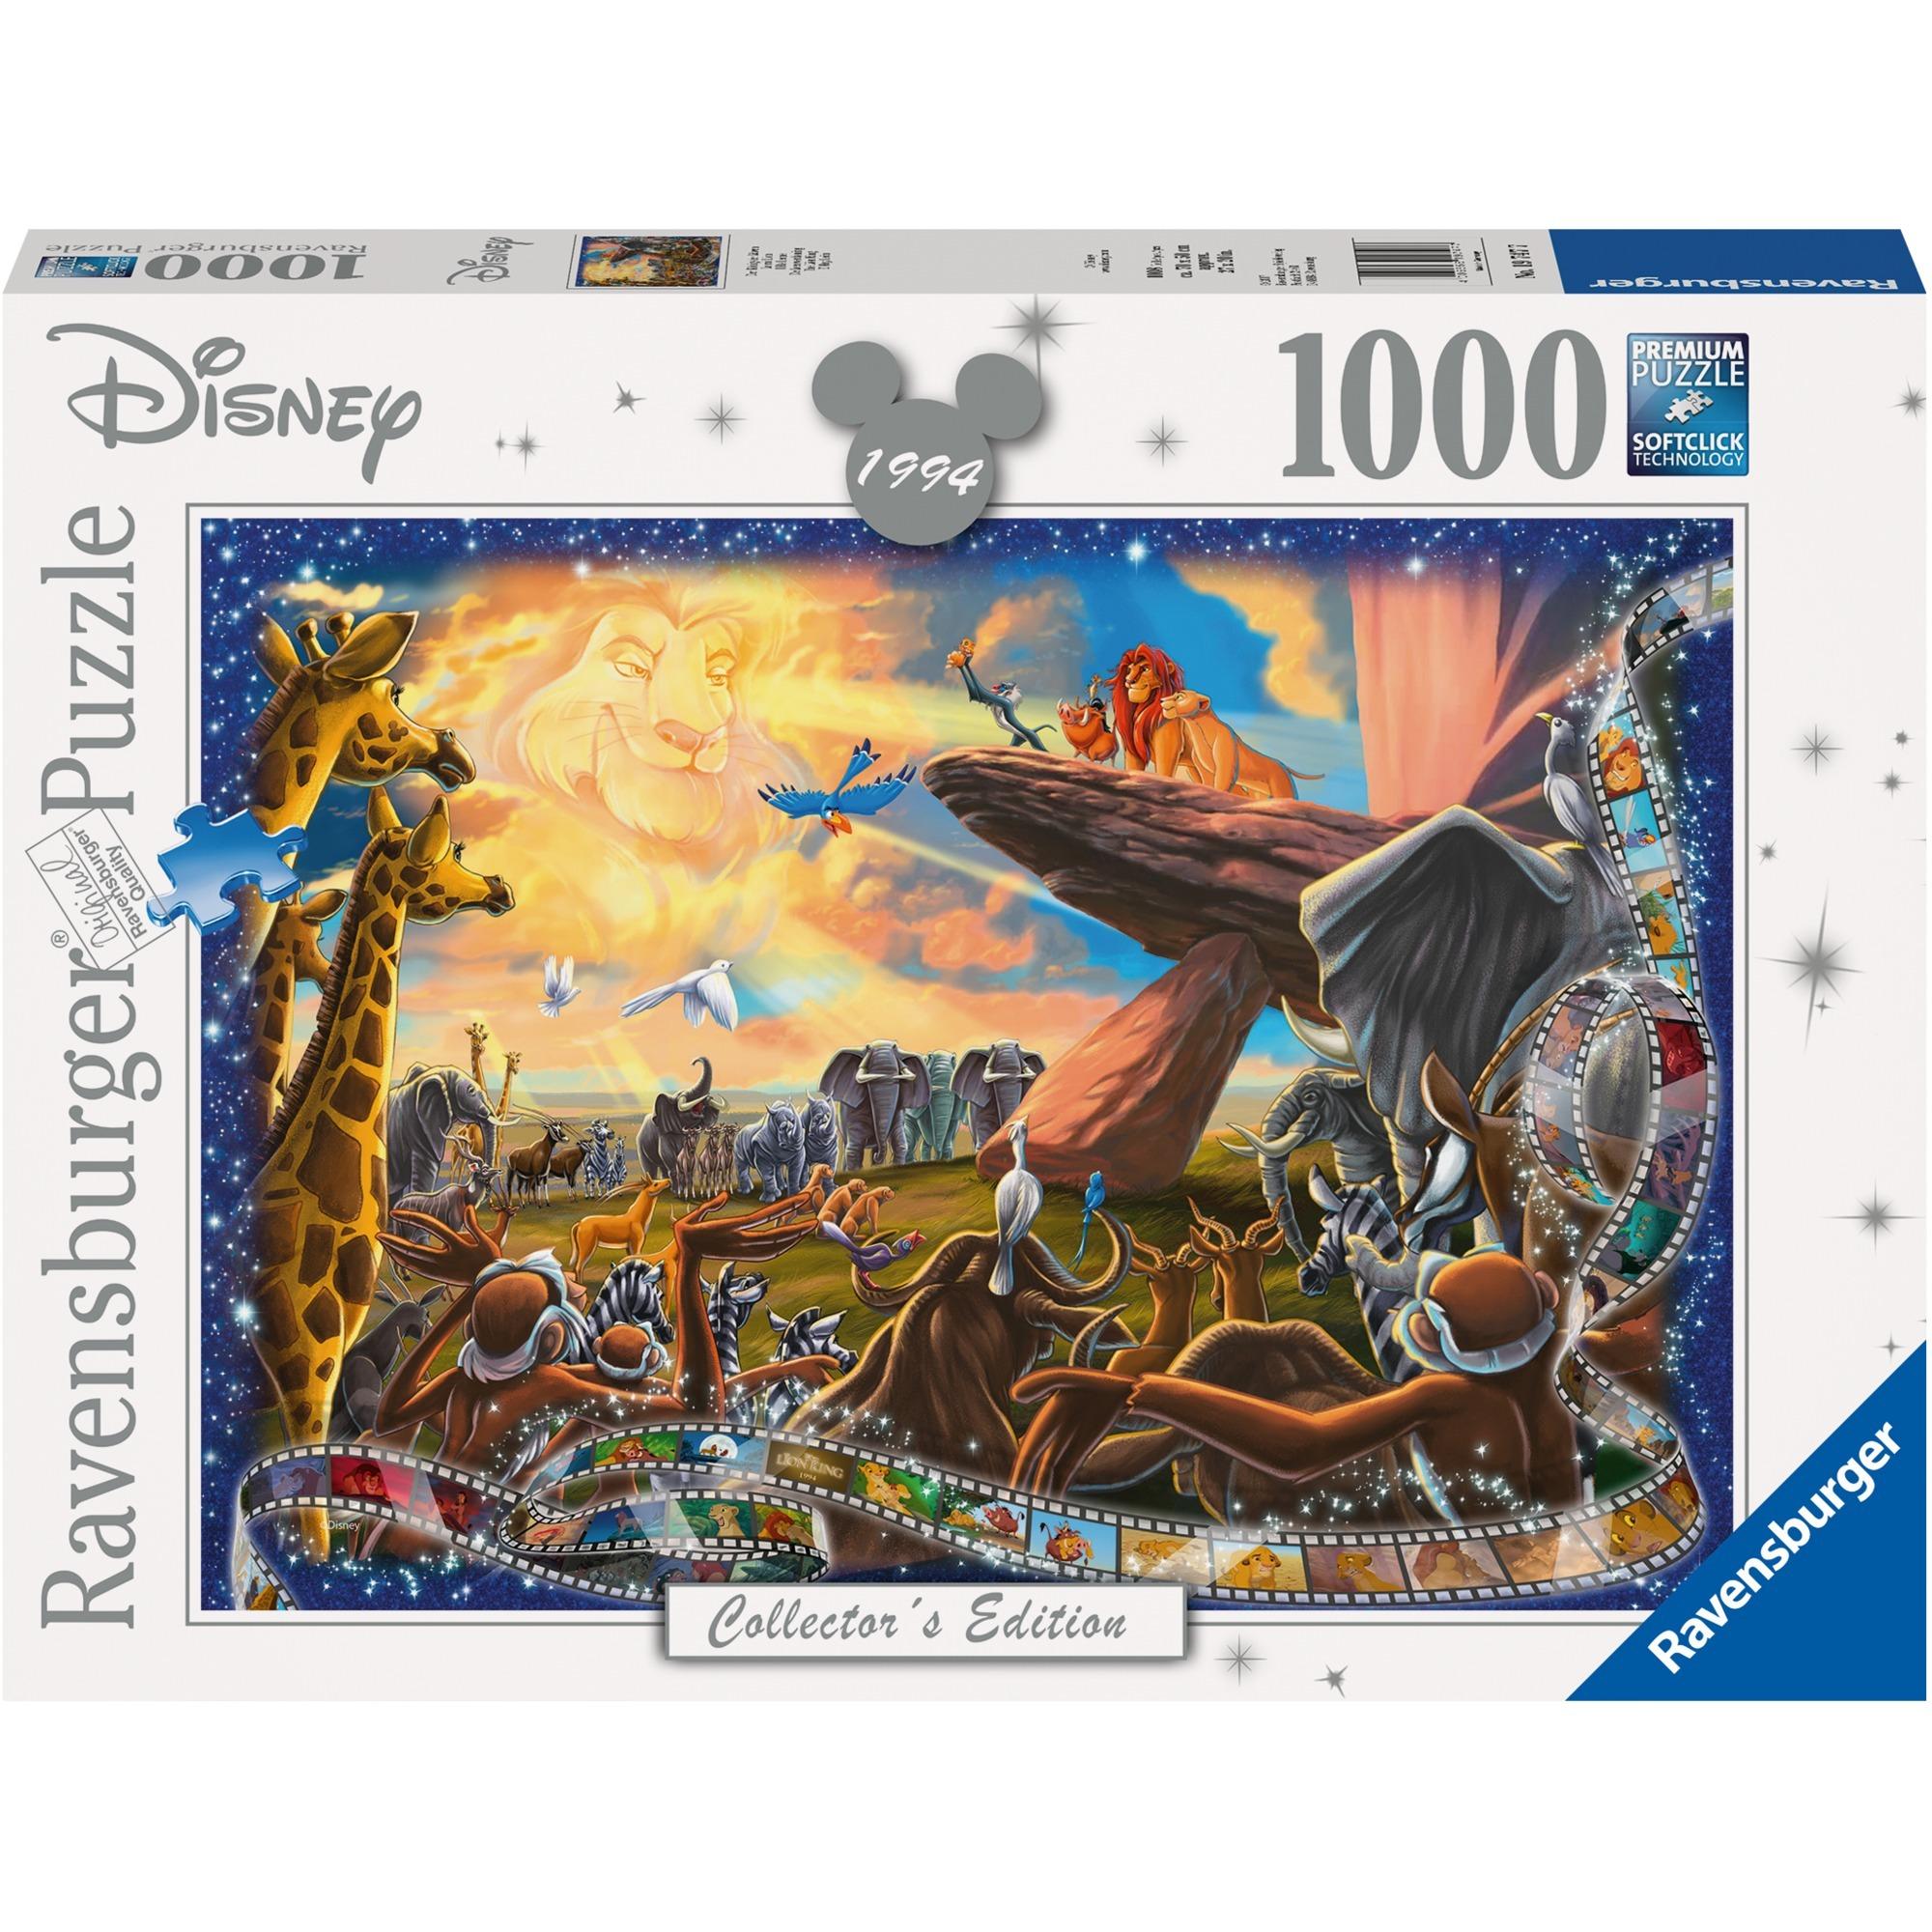 00.019.747 puzzle Puzzle rompecabezas 1000 pieza(s)